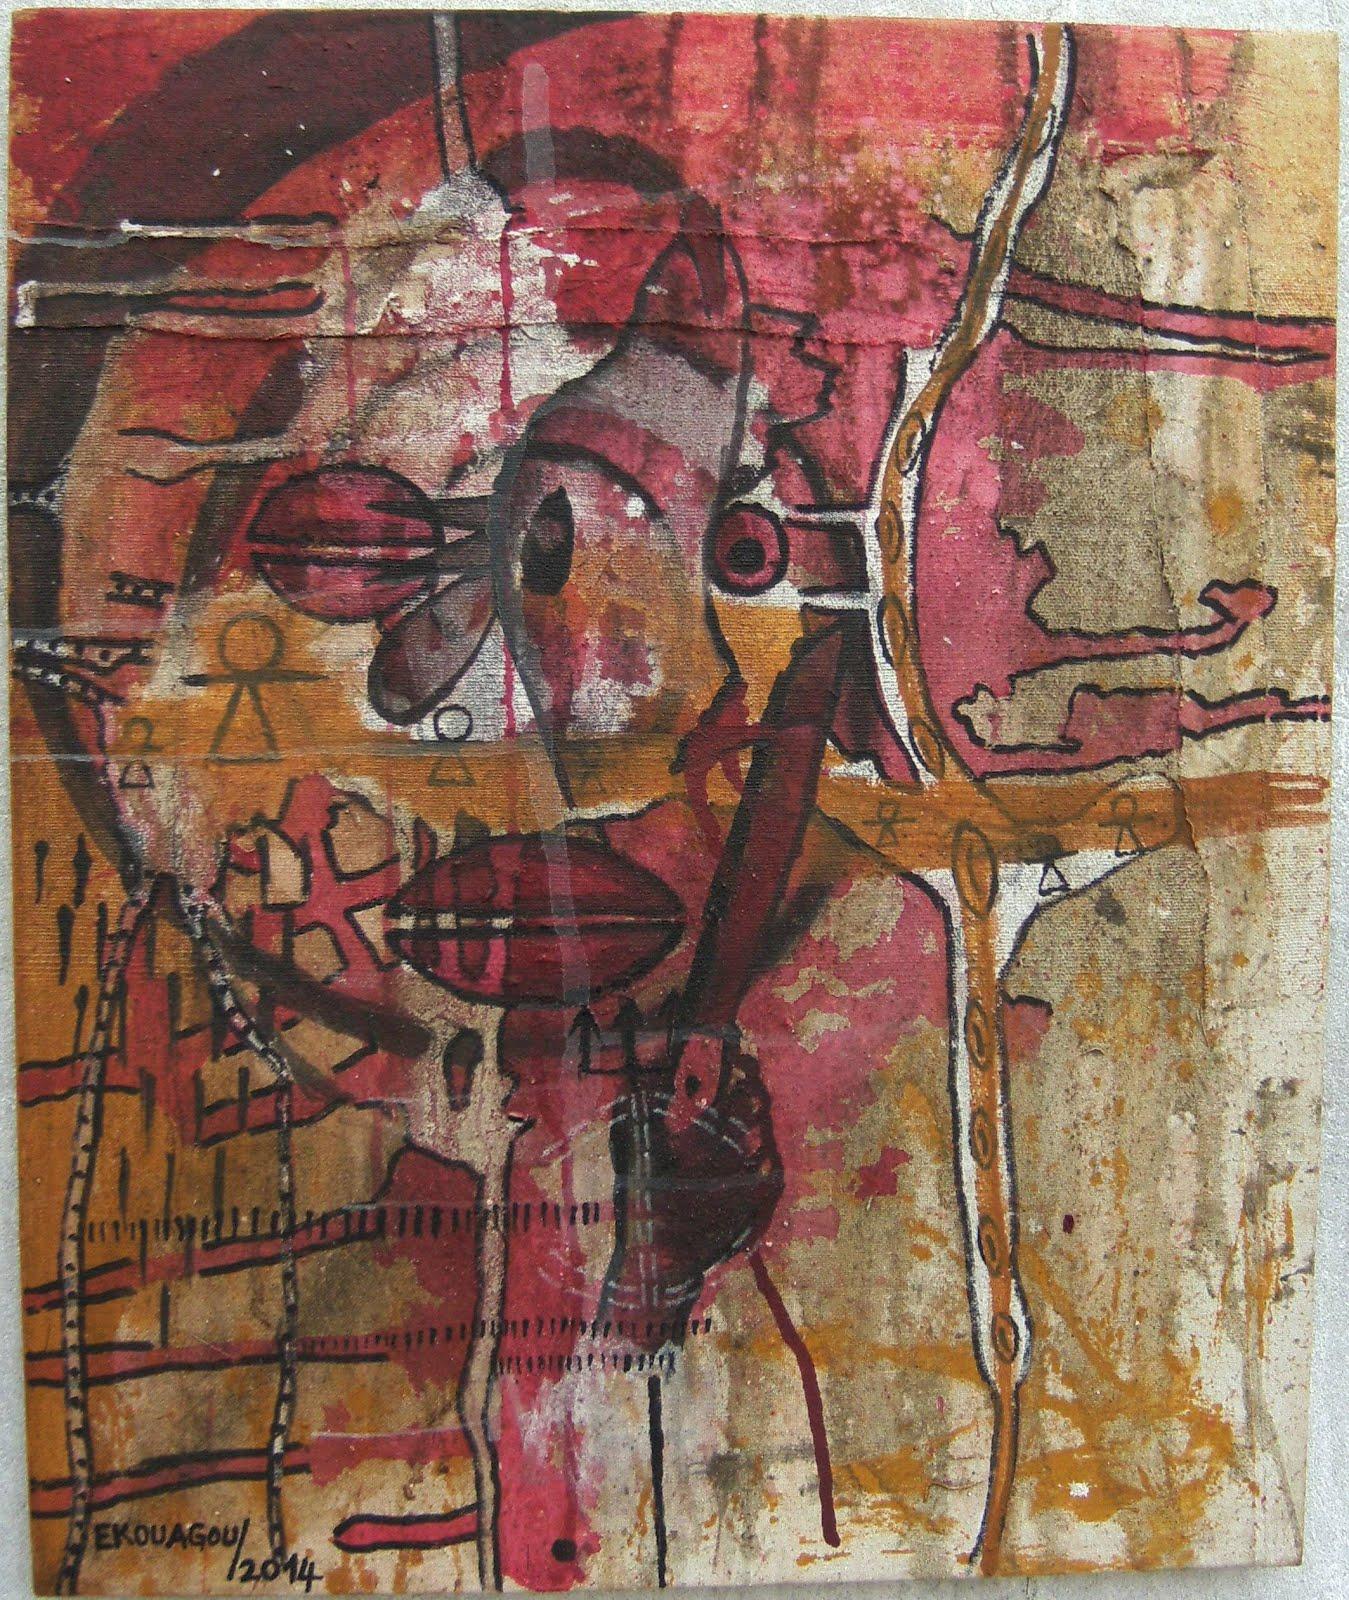 HIBIESSO,2014,60x50Cm,acrylic on canvas